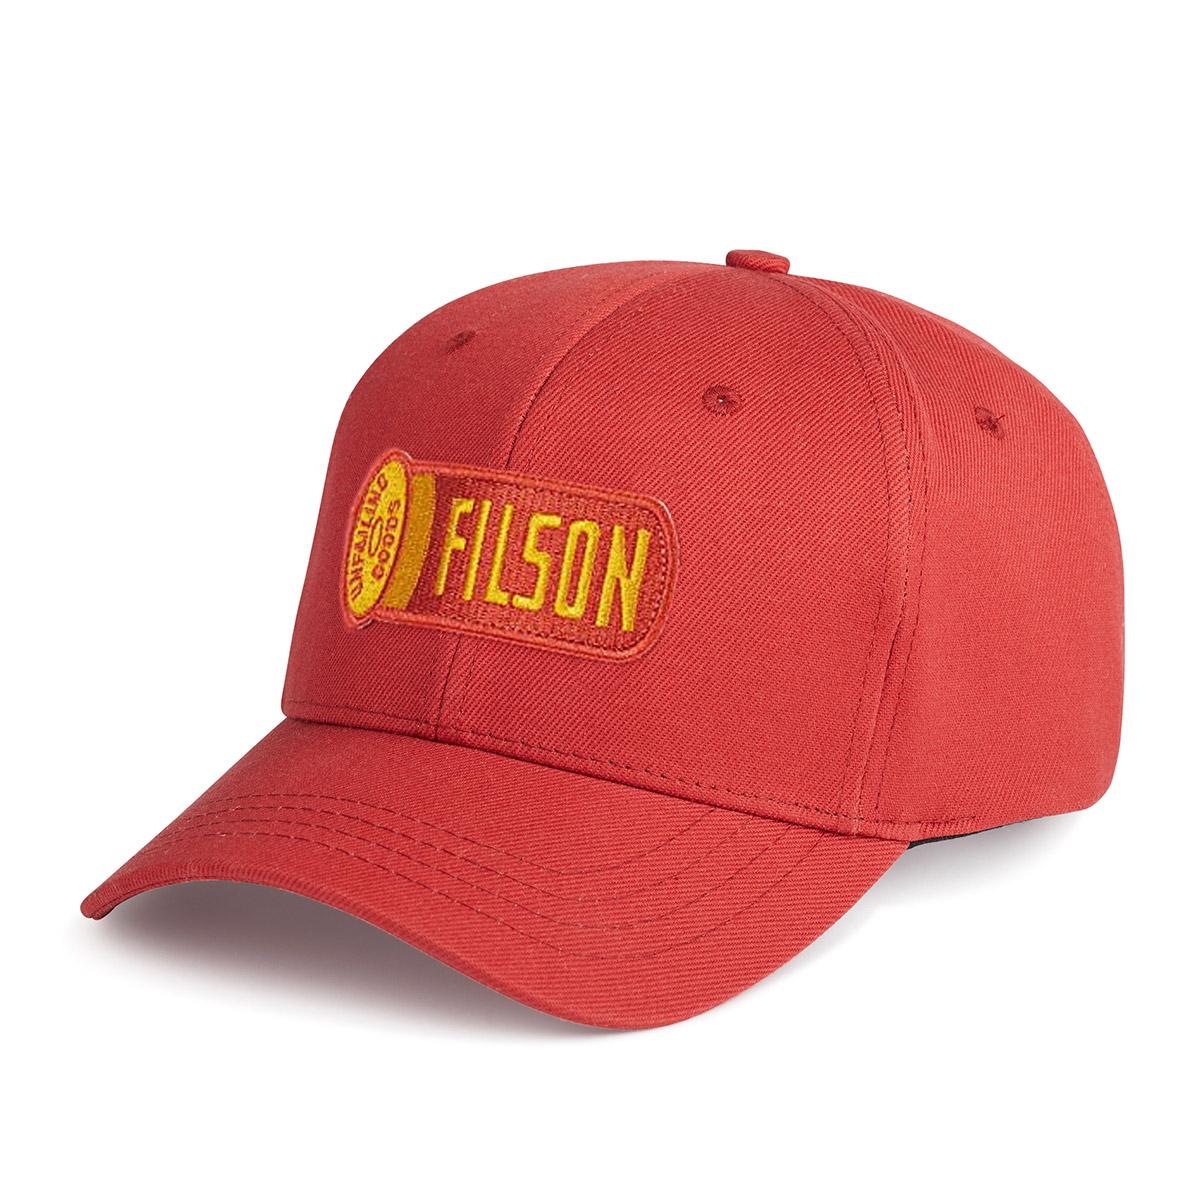 Filson Logger Cap Cardinal Red, klassieke pet die beschermt tegen de elementen